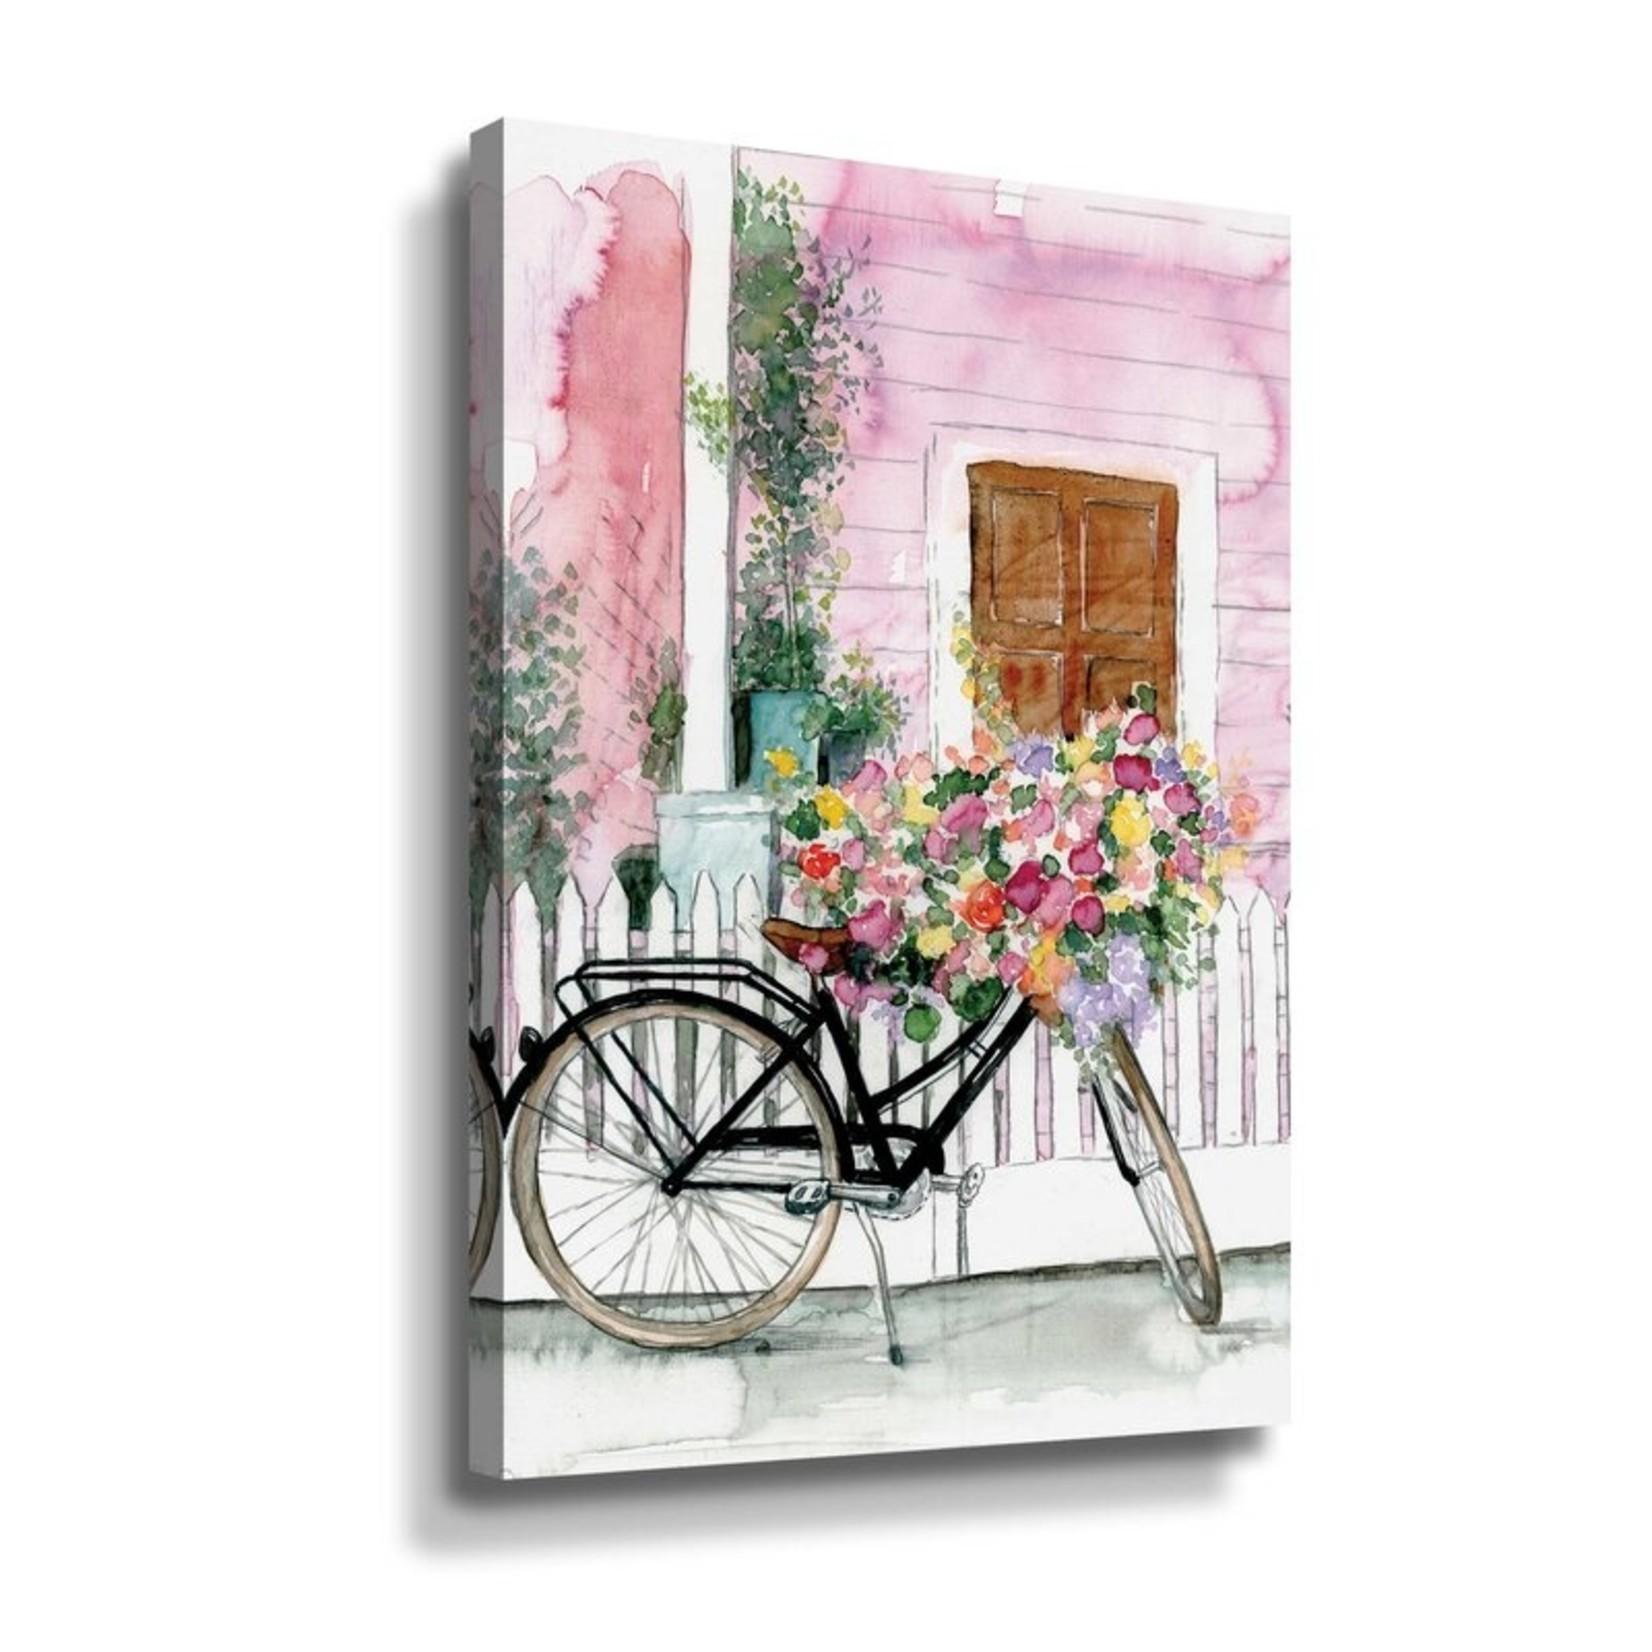 "*12"" x 18"" - Spring Bike Ride by Portfolio Dogwood - Painting Print on Canvas"